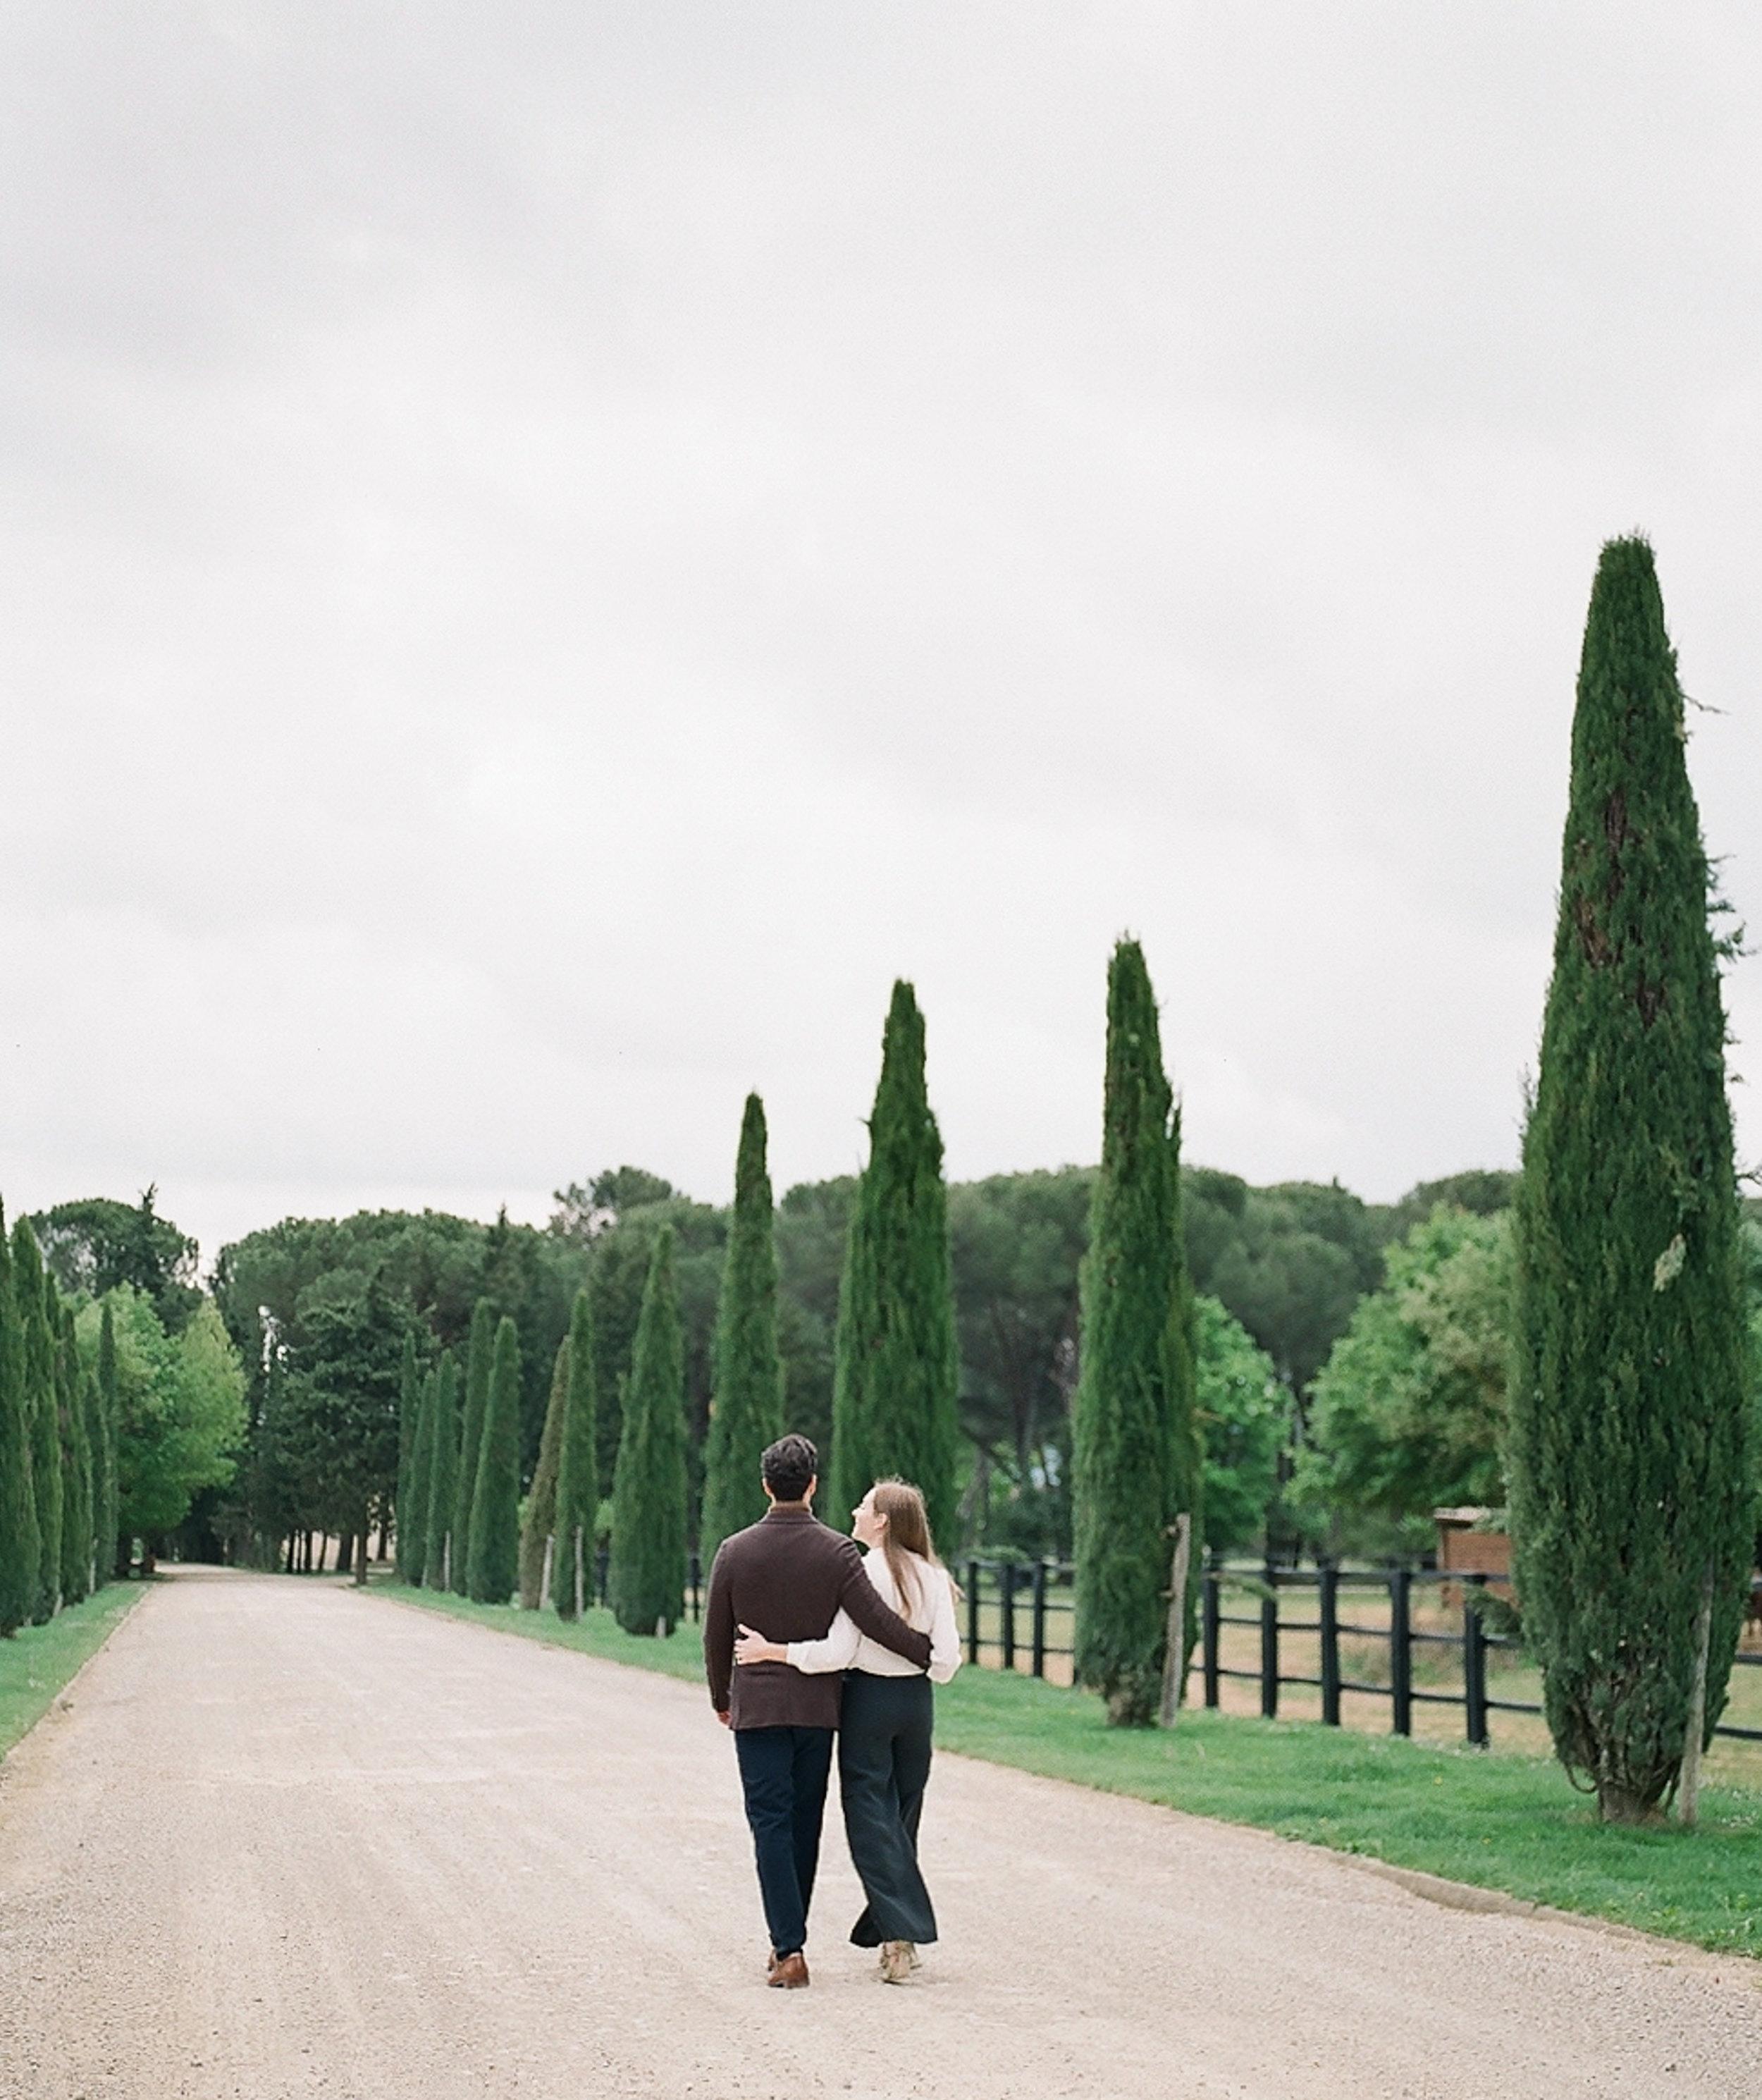 Bonphotage Chicago and Destination Fine Art Wedding Photography